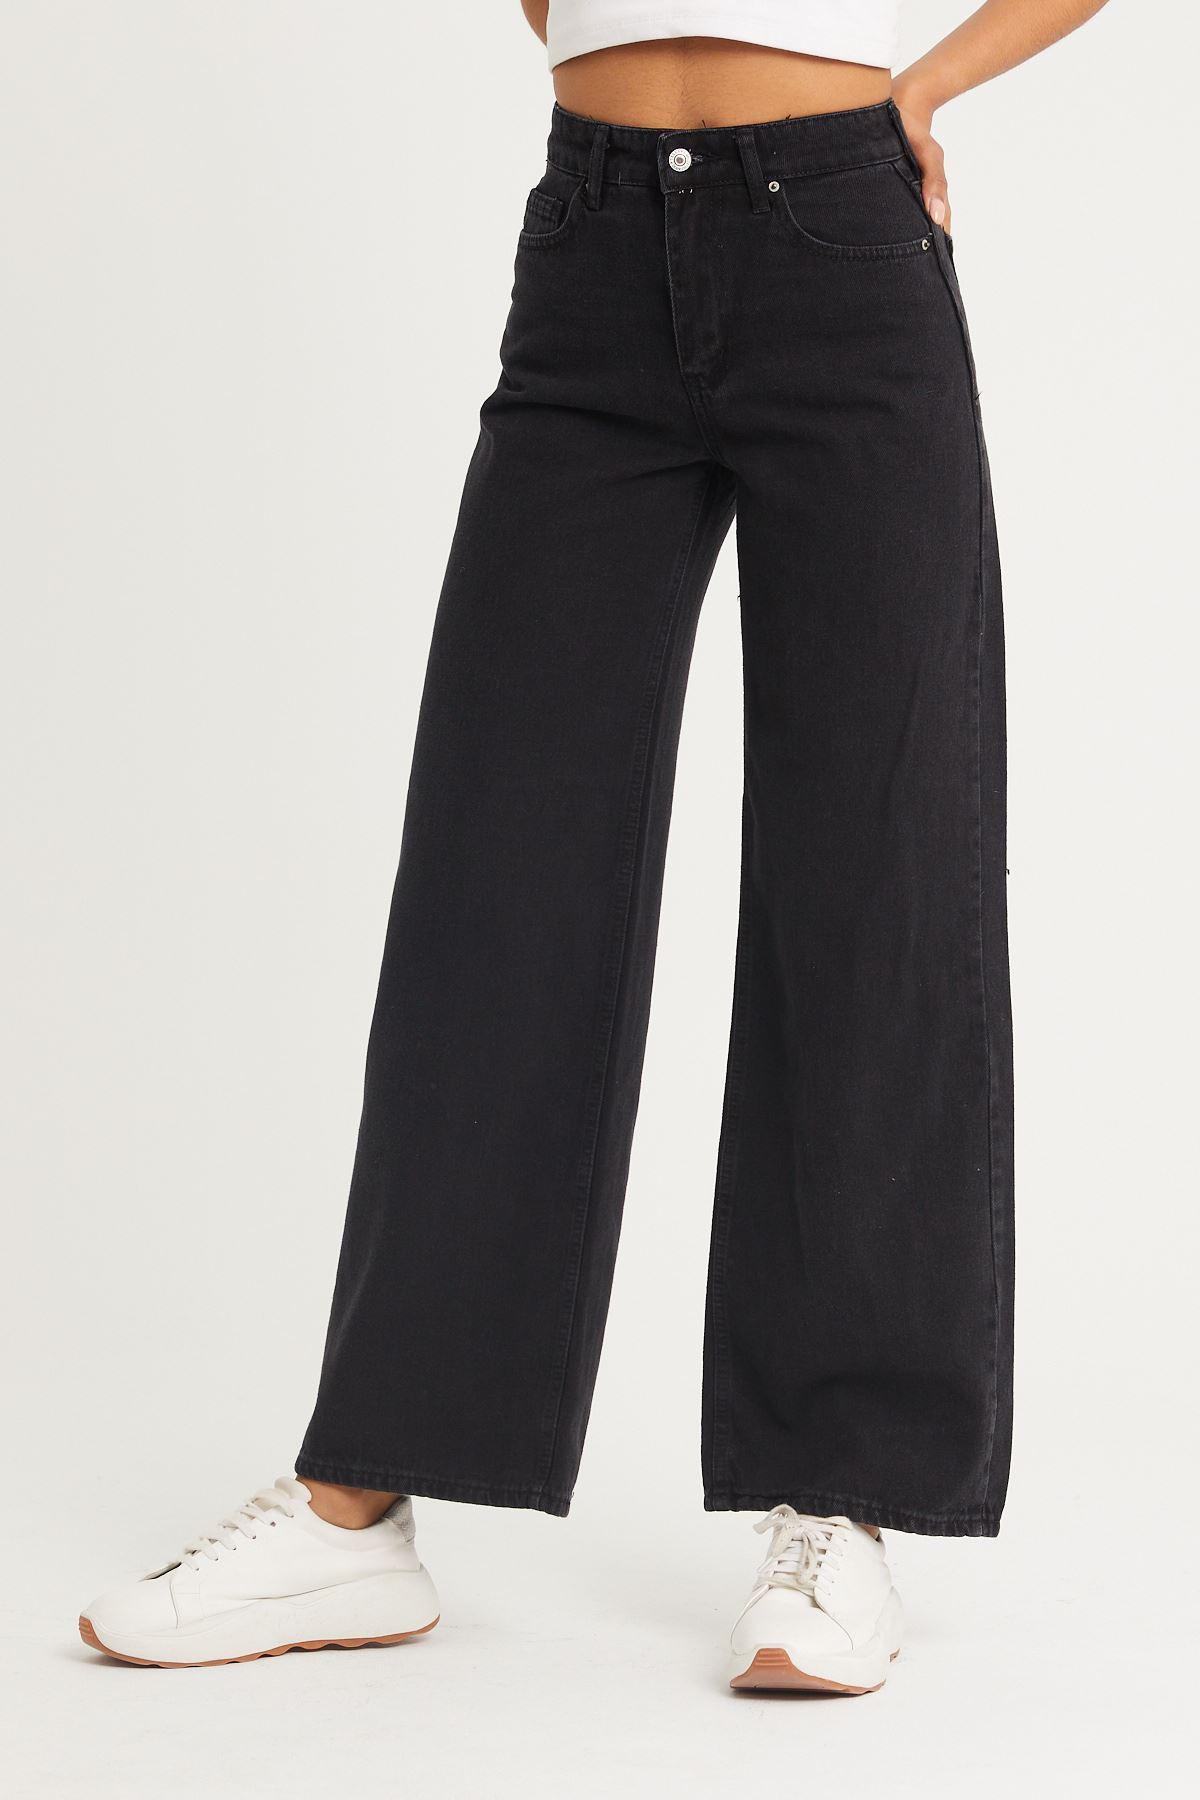 Yüksek Bel Geniş Paça Kot Pantolon